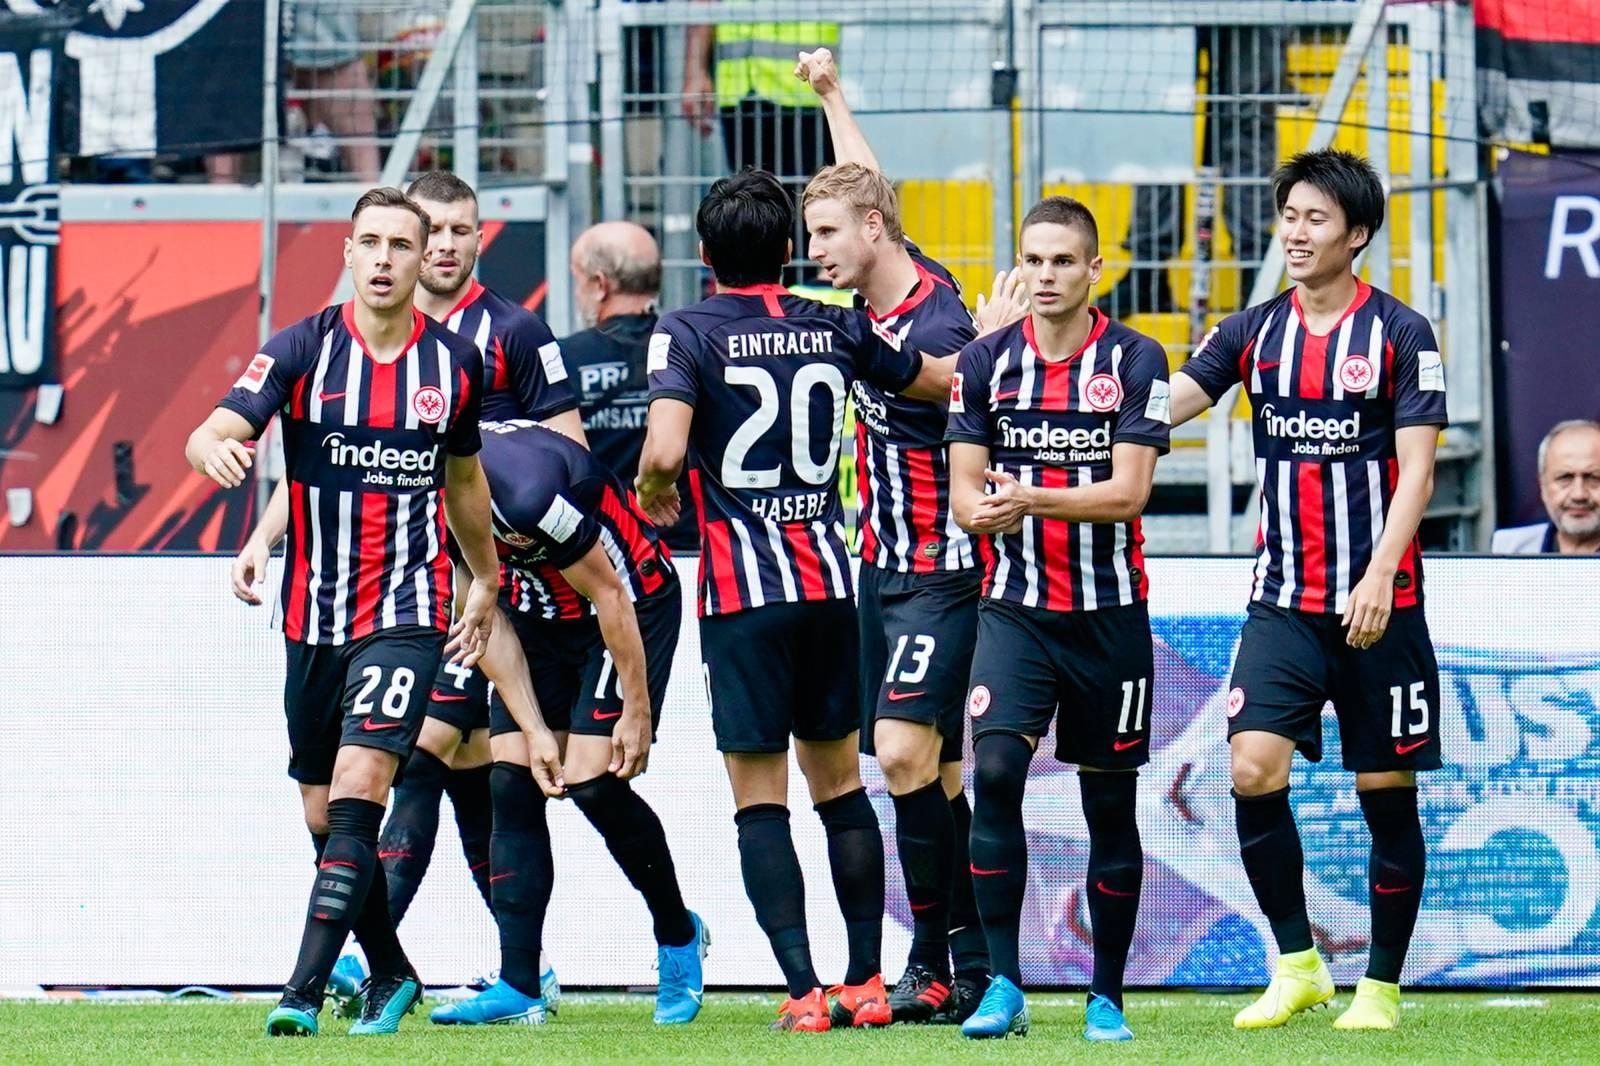 Eintracht Frankfurt v Hoffenheim